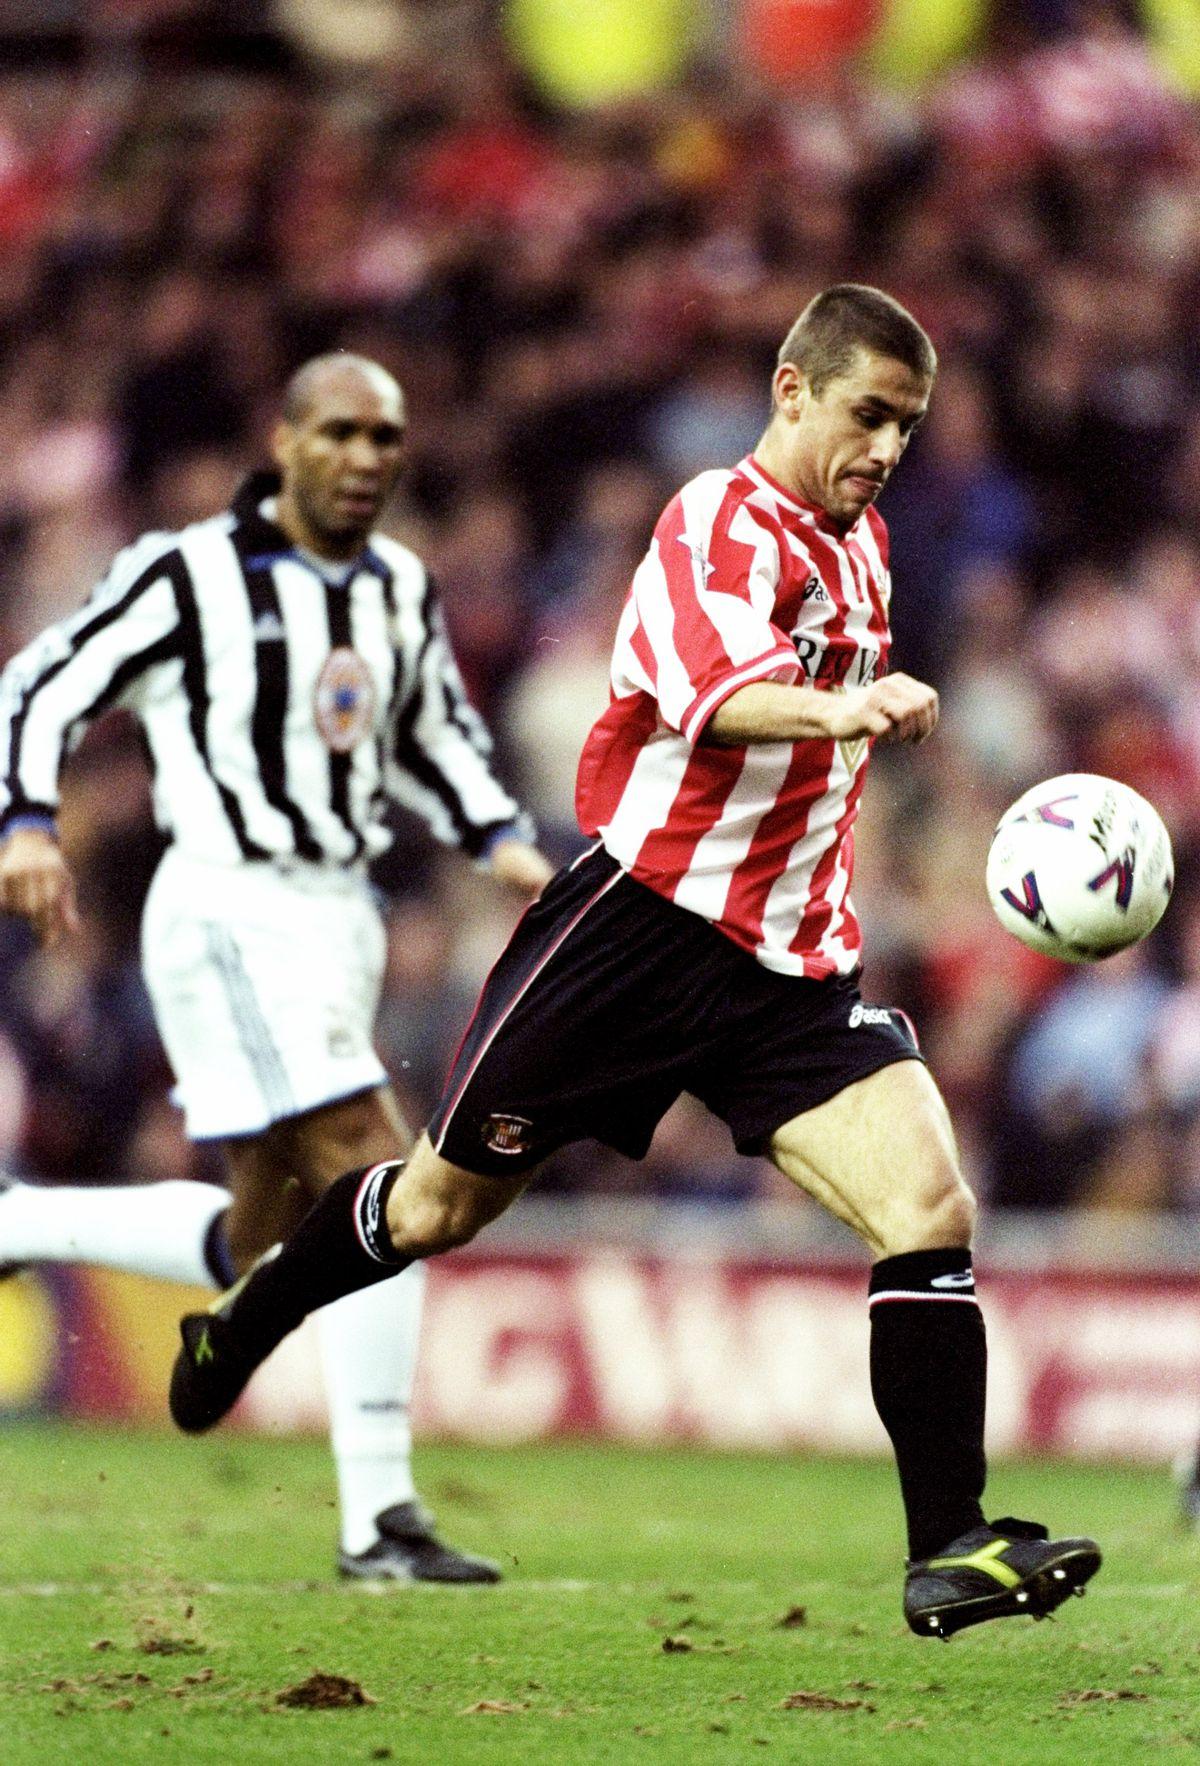 Kevin Phillips of Sunderland